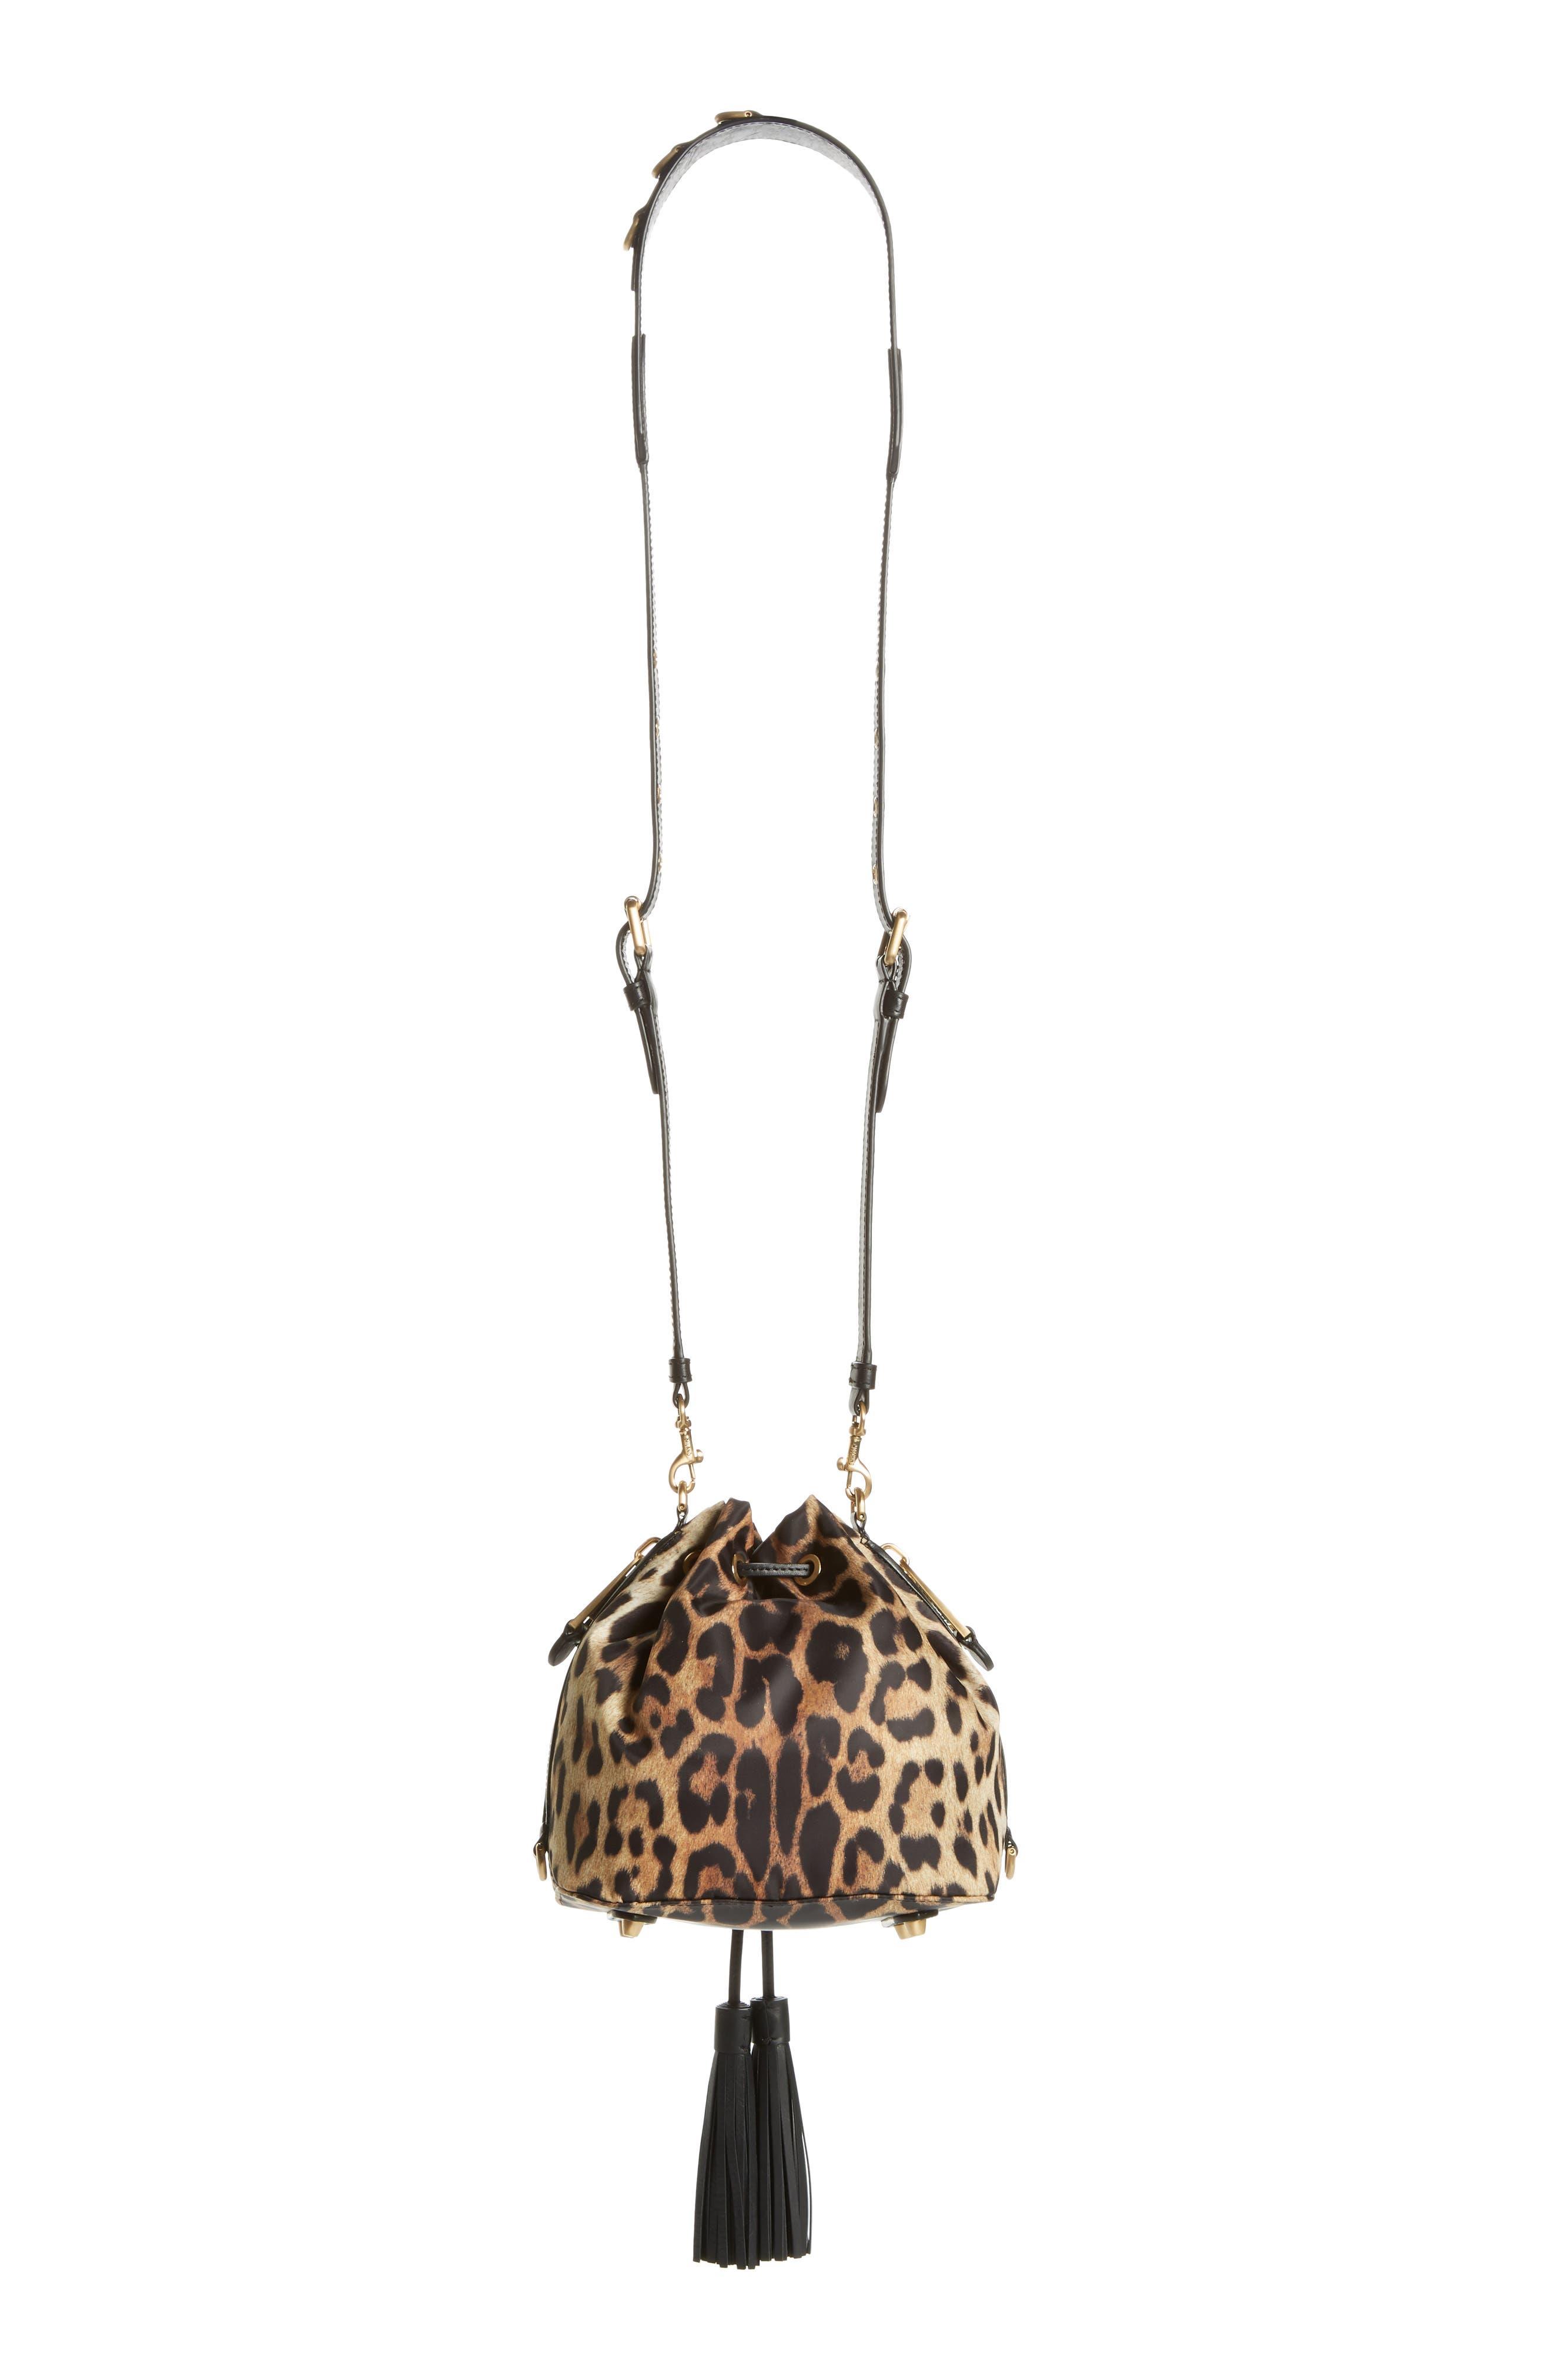 MOSCHINO, Leopard Print Nylon Convertible Bucket Bag, Alternate thumbnail 4, color, BLACK